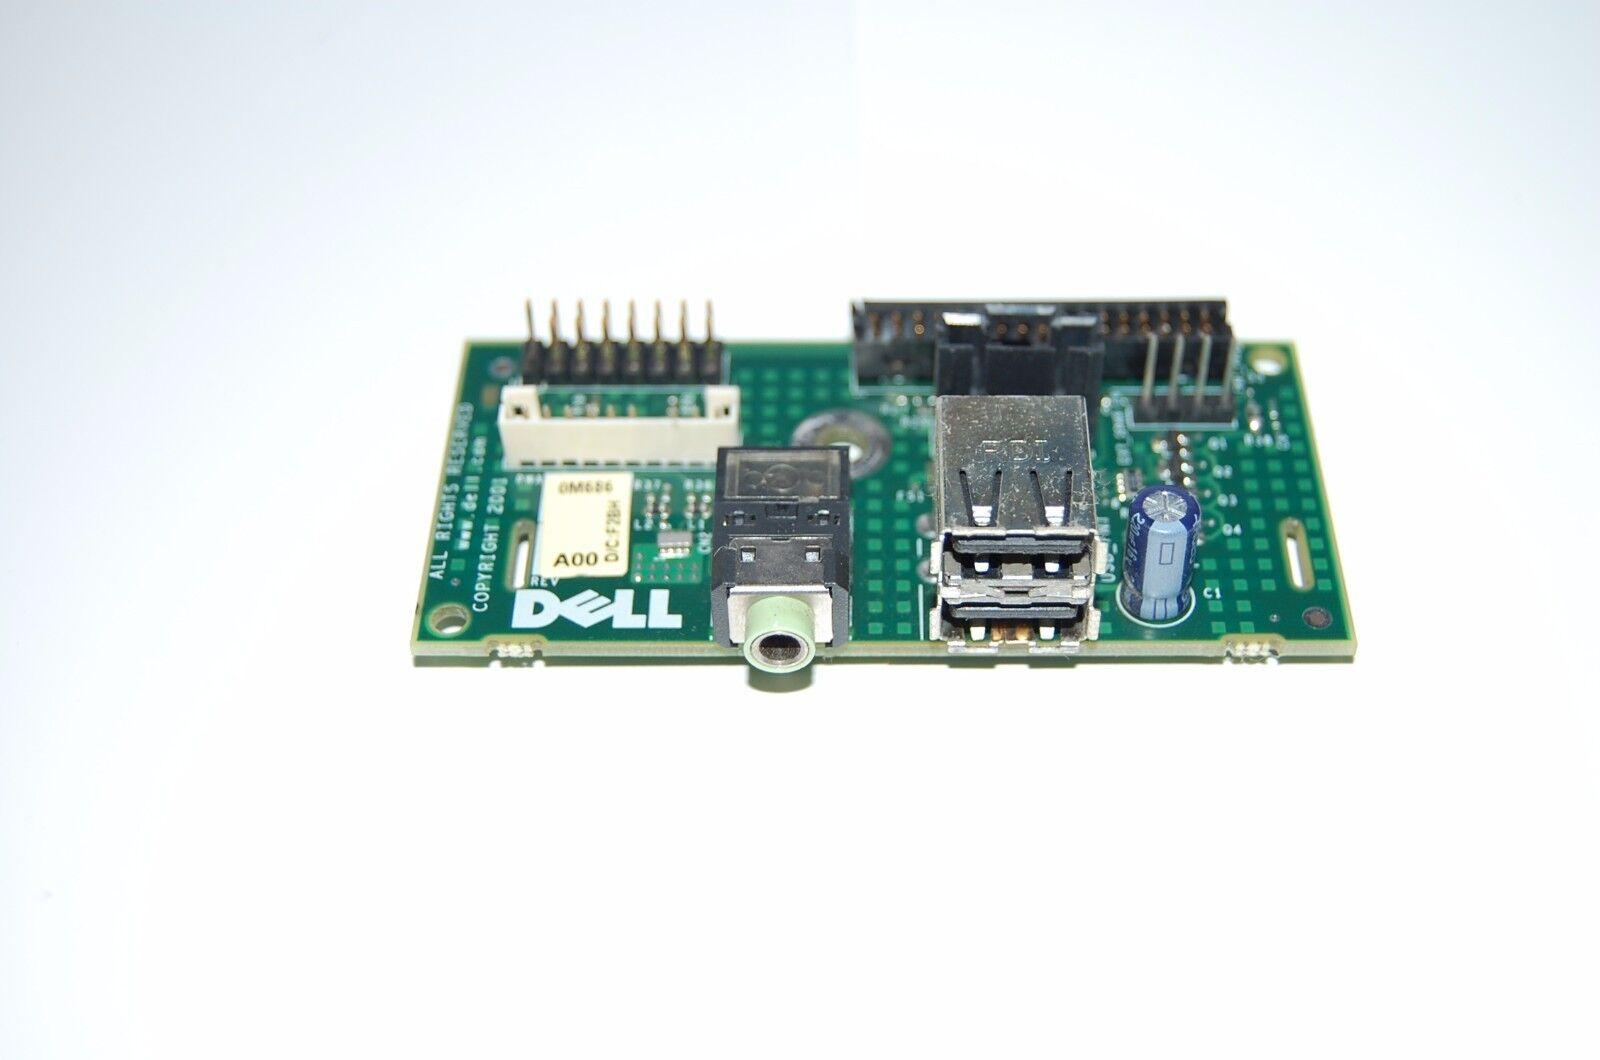 Dell Dimension 8300 Chipset Descargar Controlador